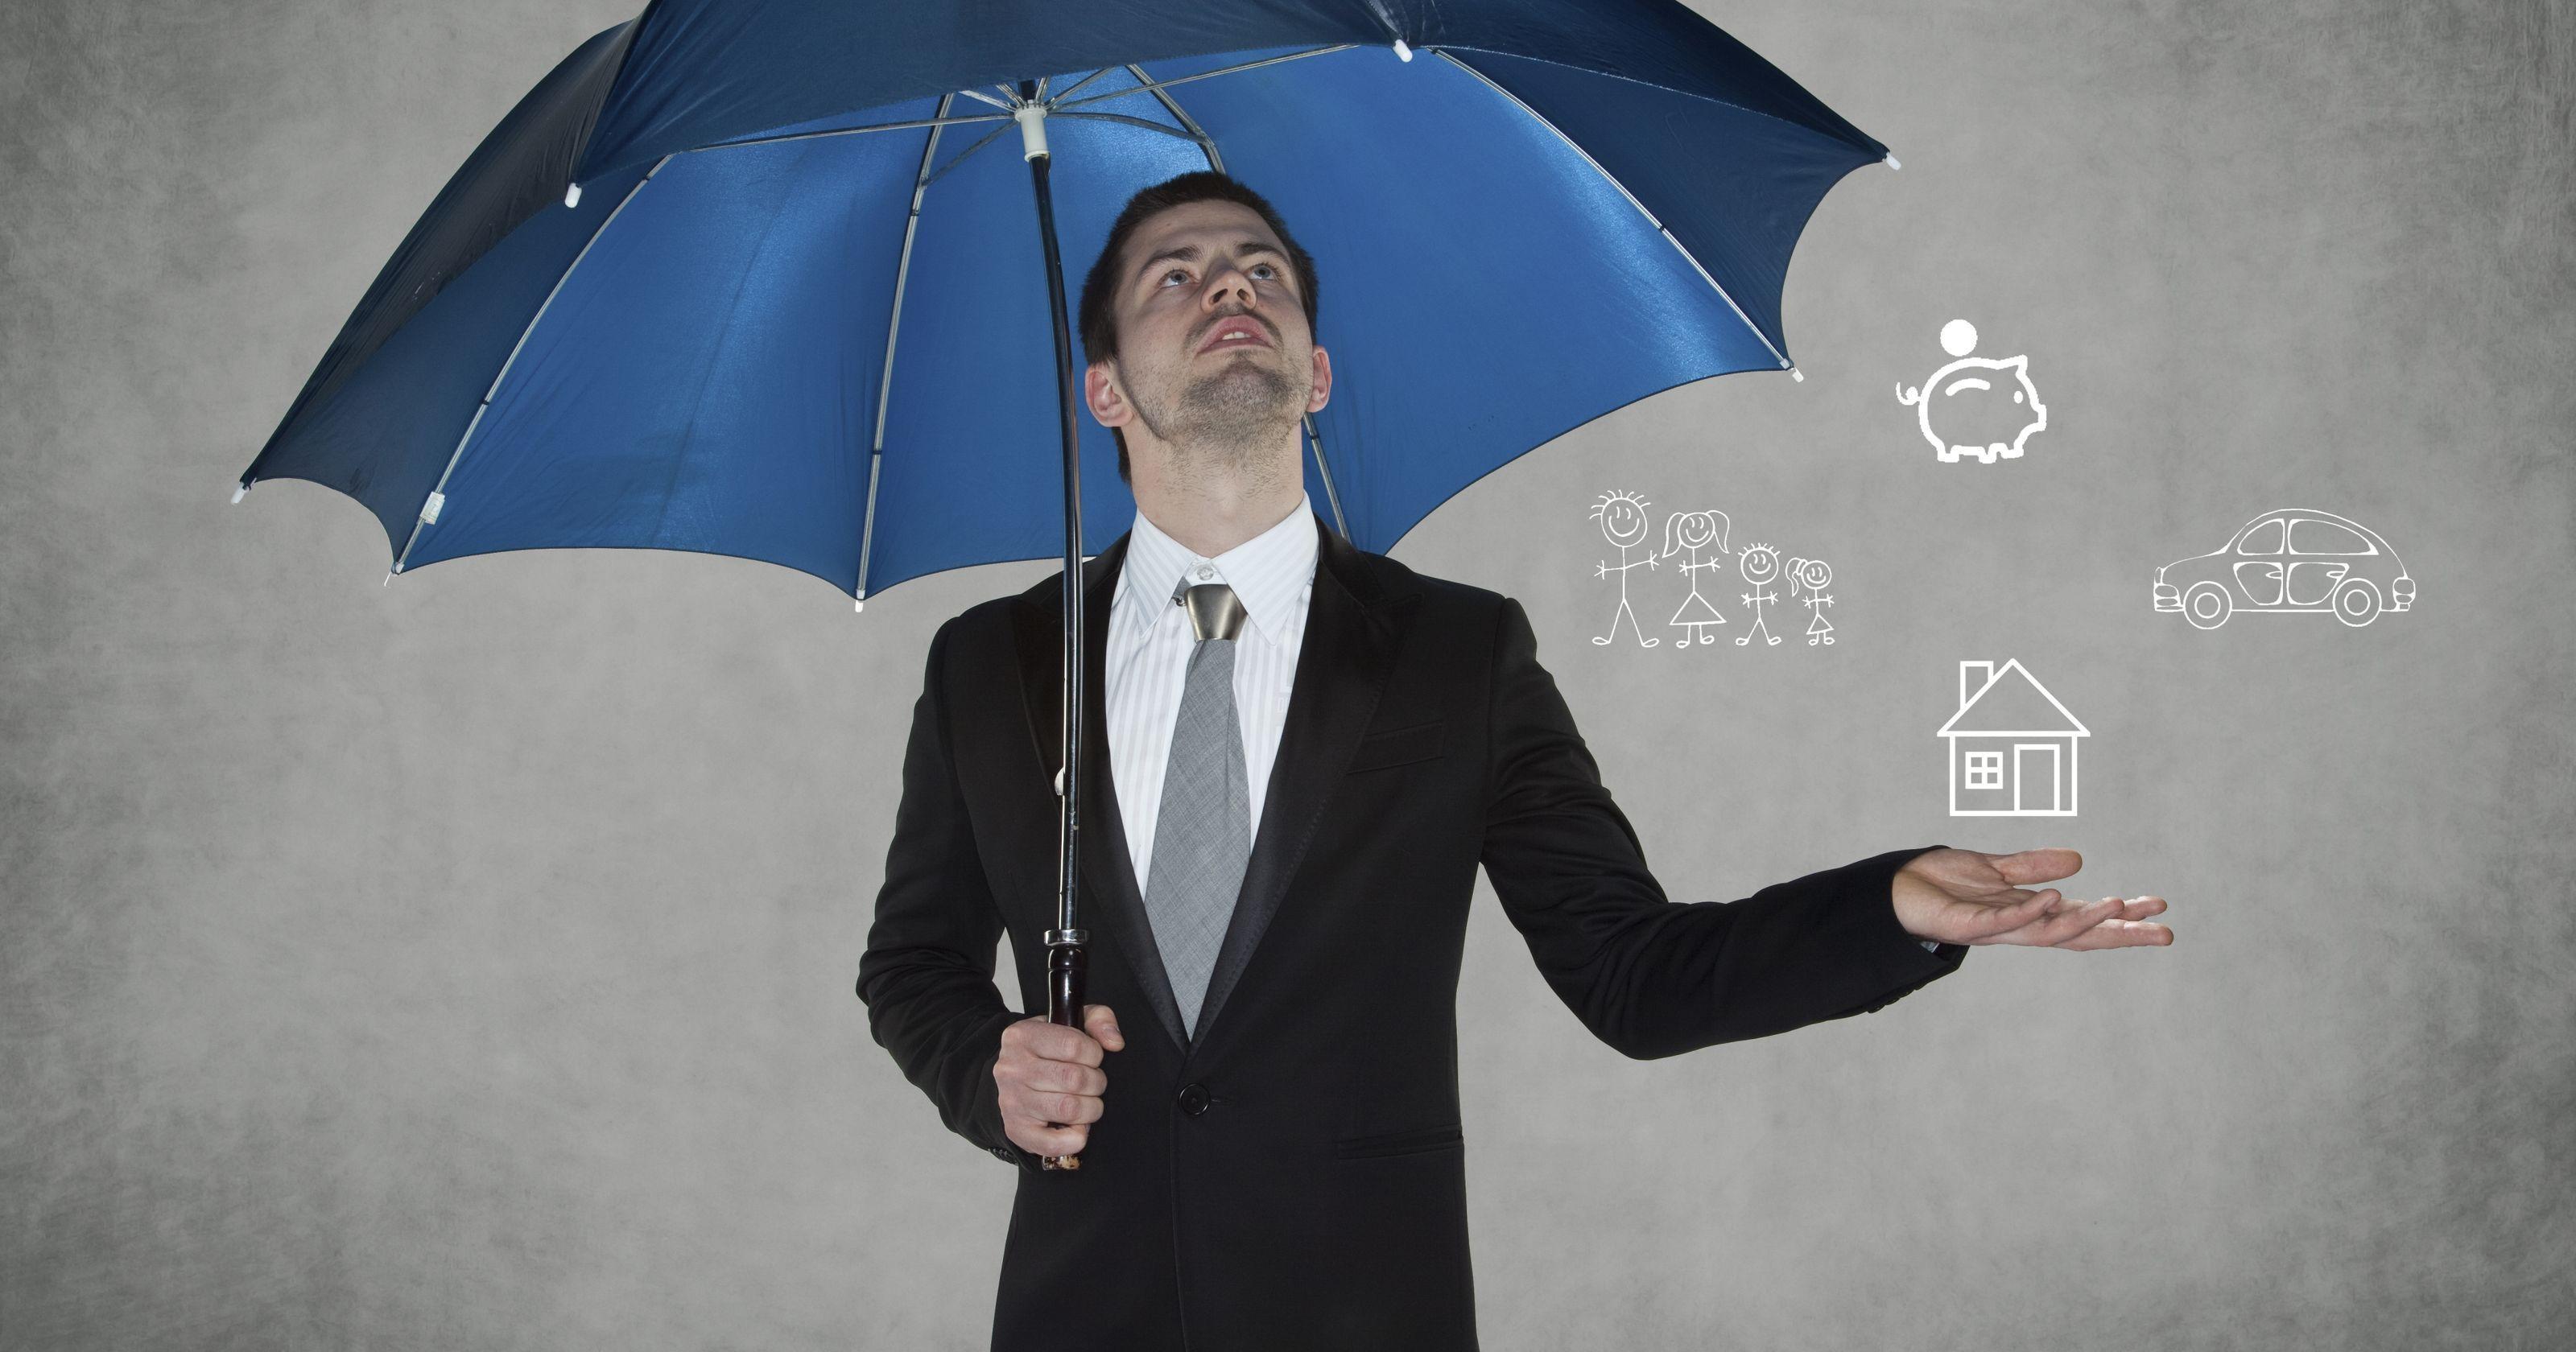 Umbrella insurance Protection for that nest egg